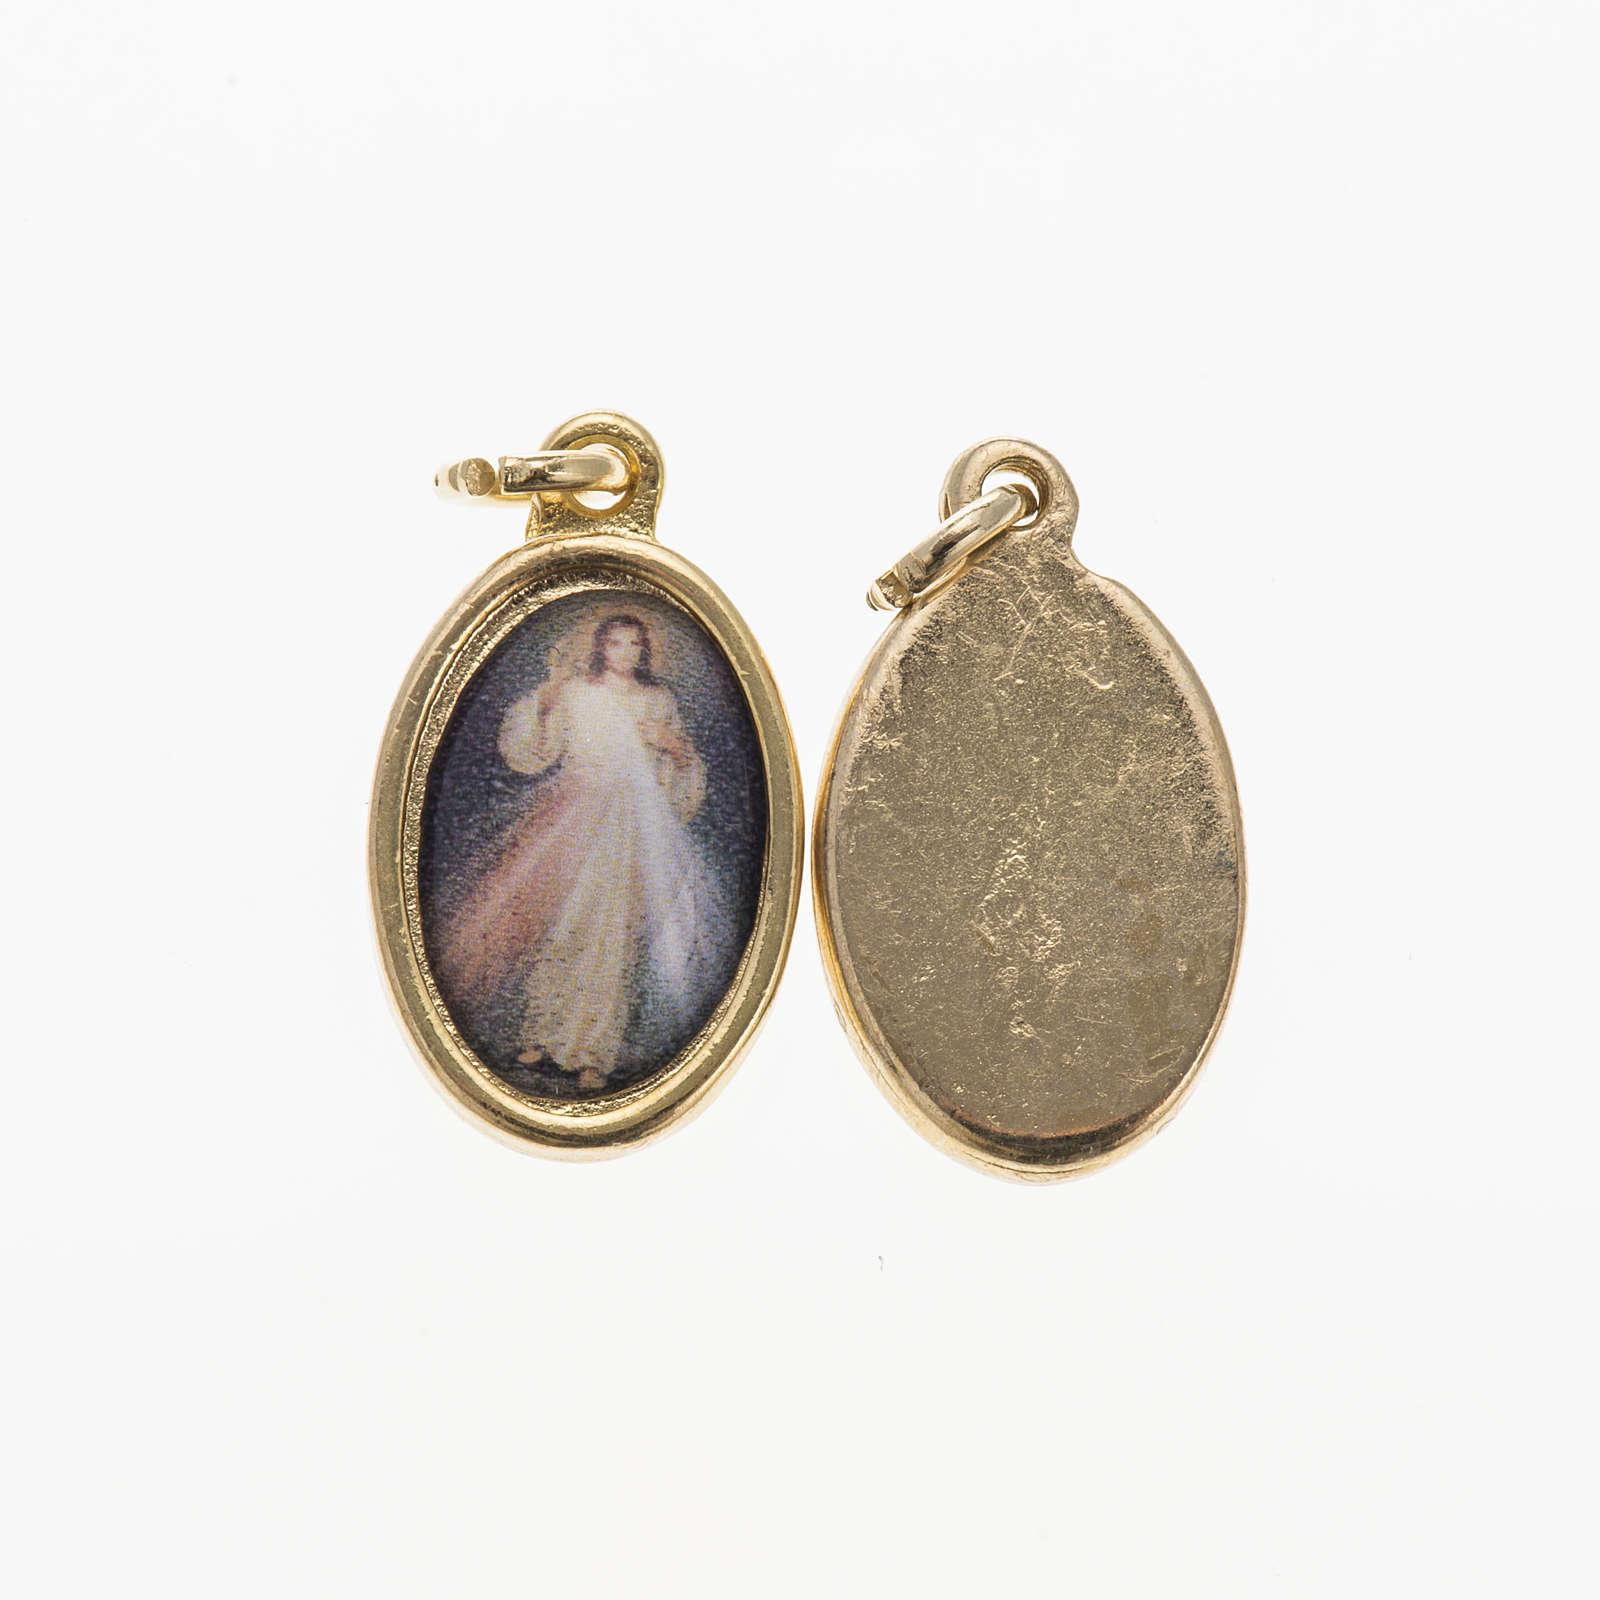 Medaglia Gesù Misericordioso metallo dorato resina 1,5x1 cm 4